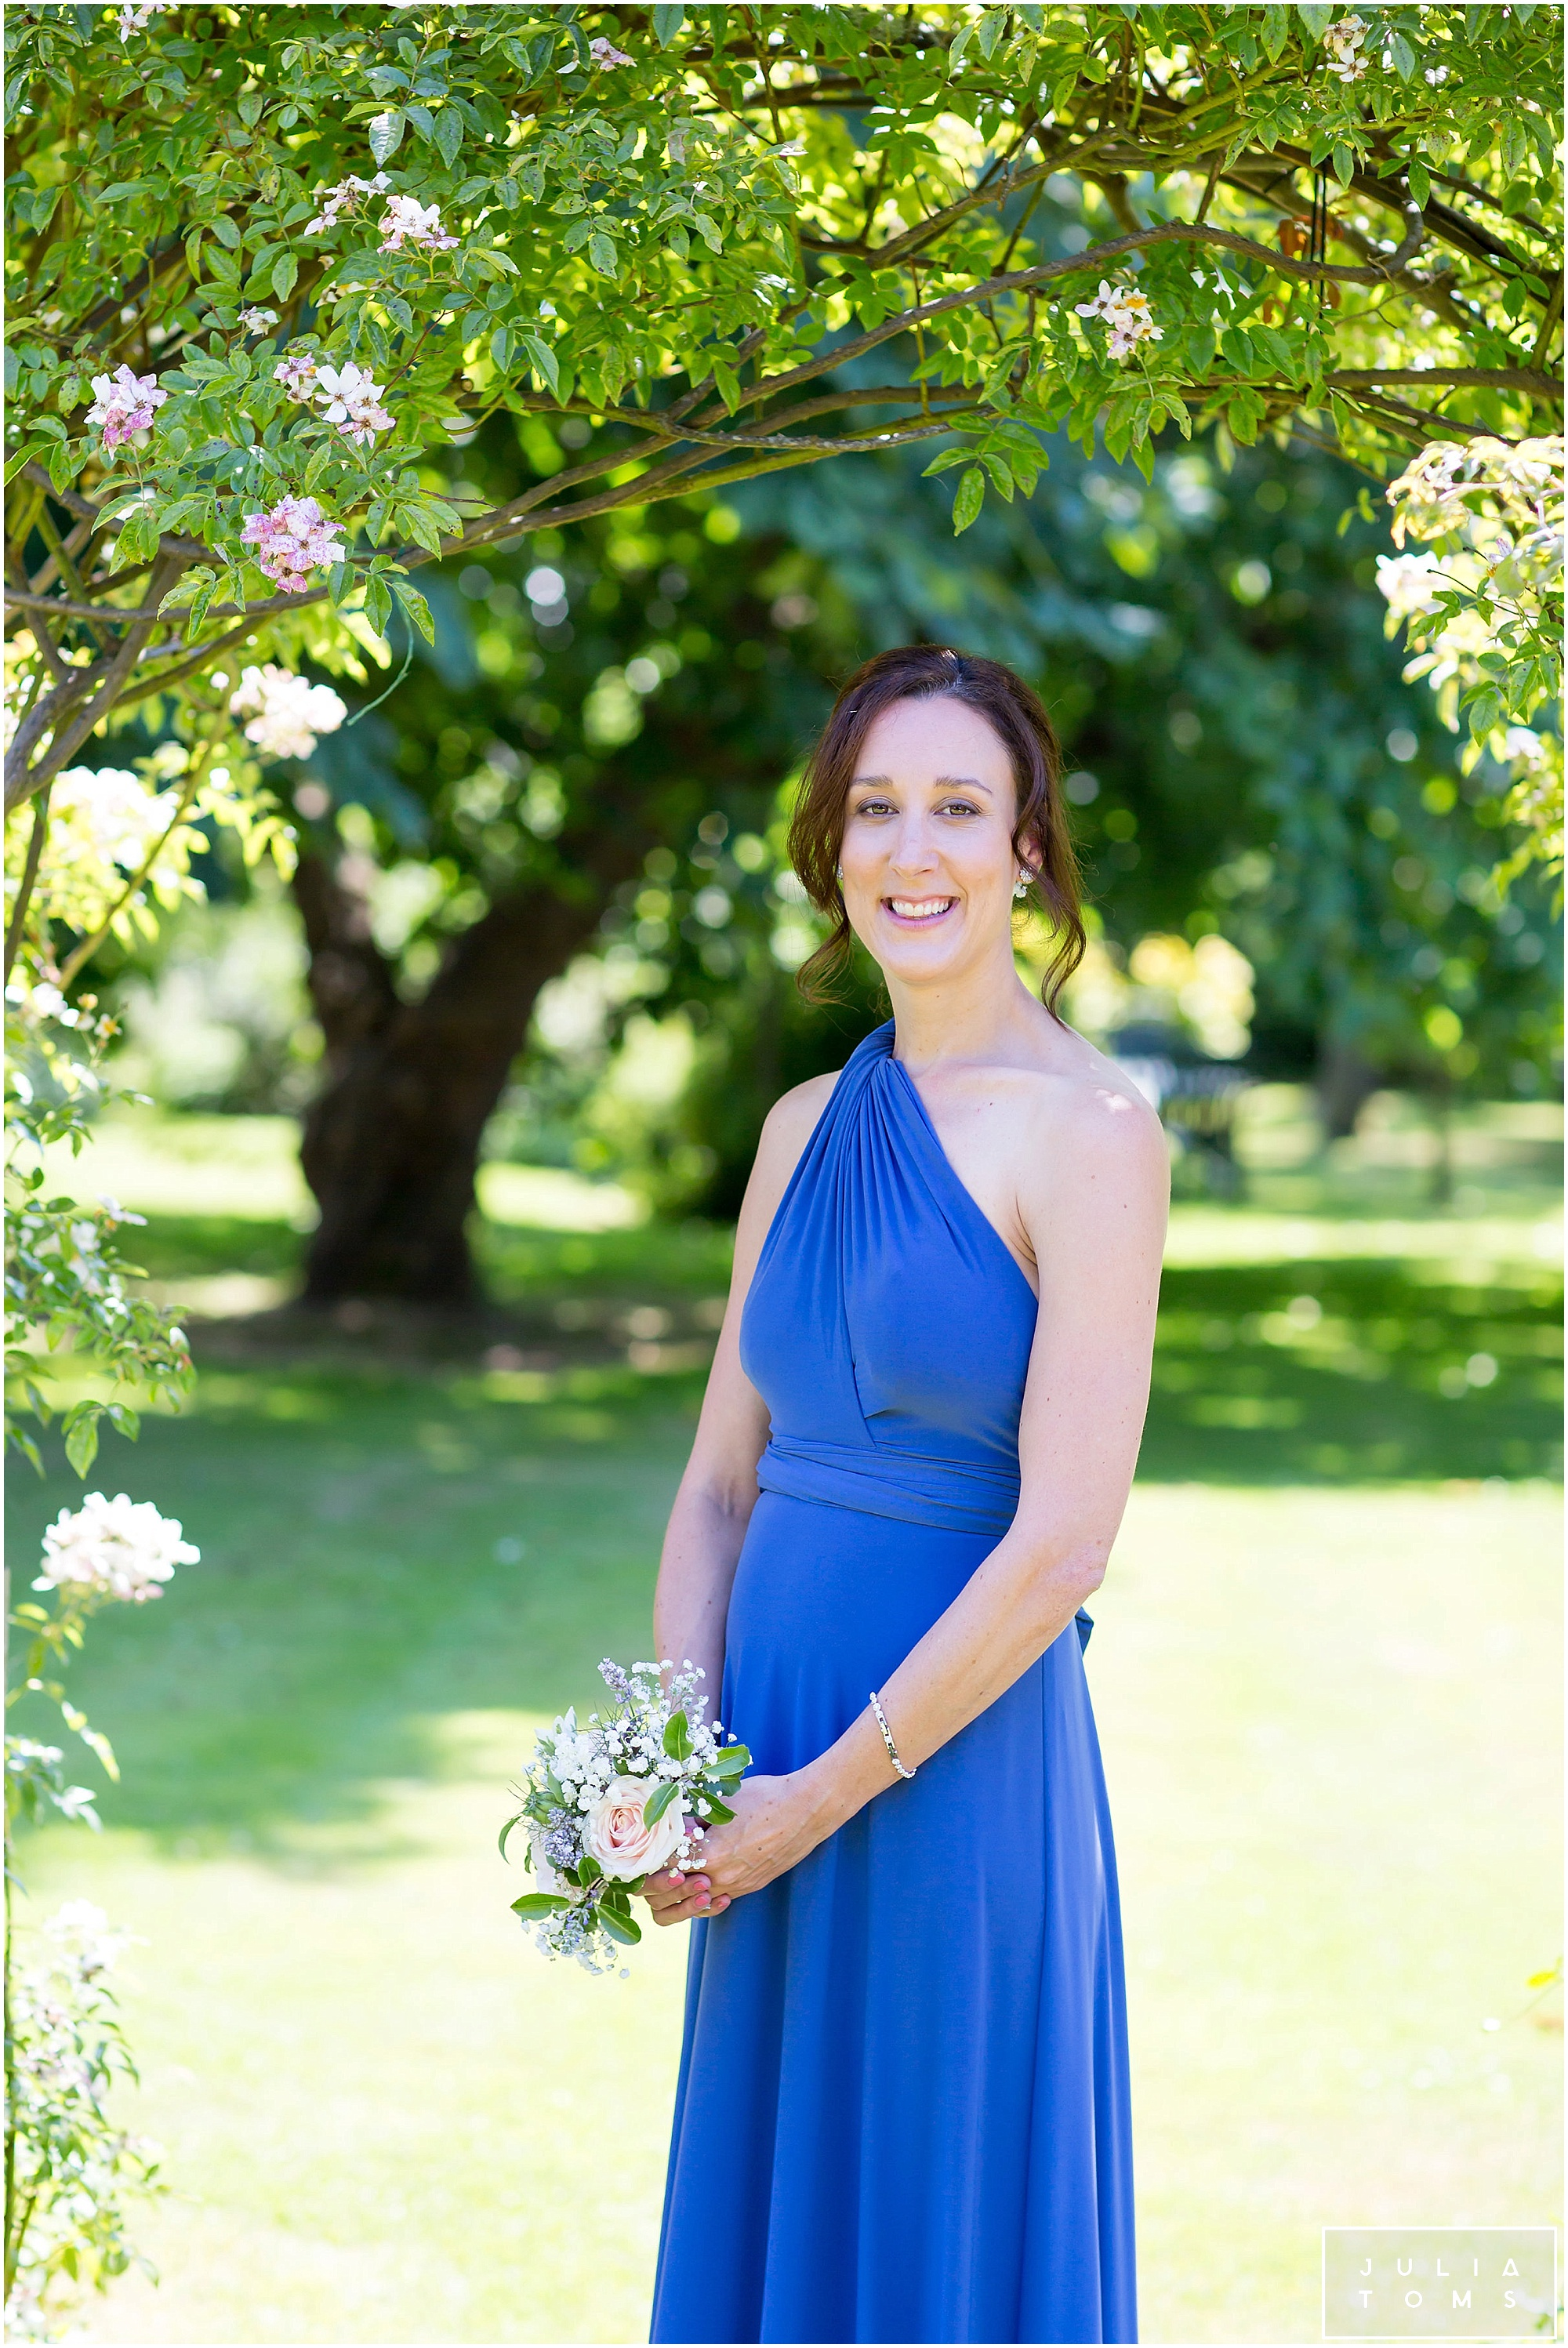 julia_toms_chichester_wedding_photographer_portsmouth_008.jpg